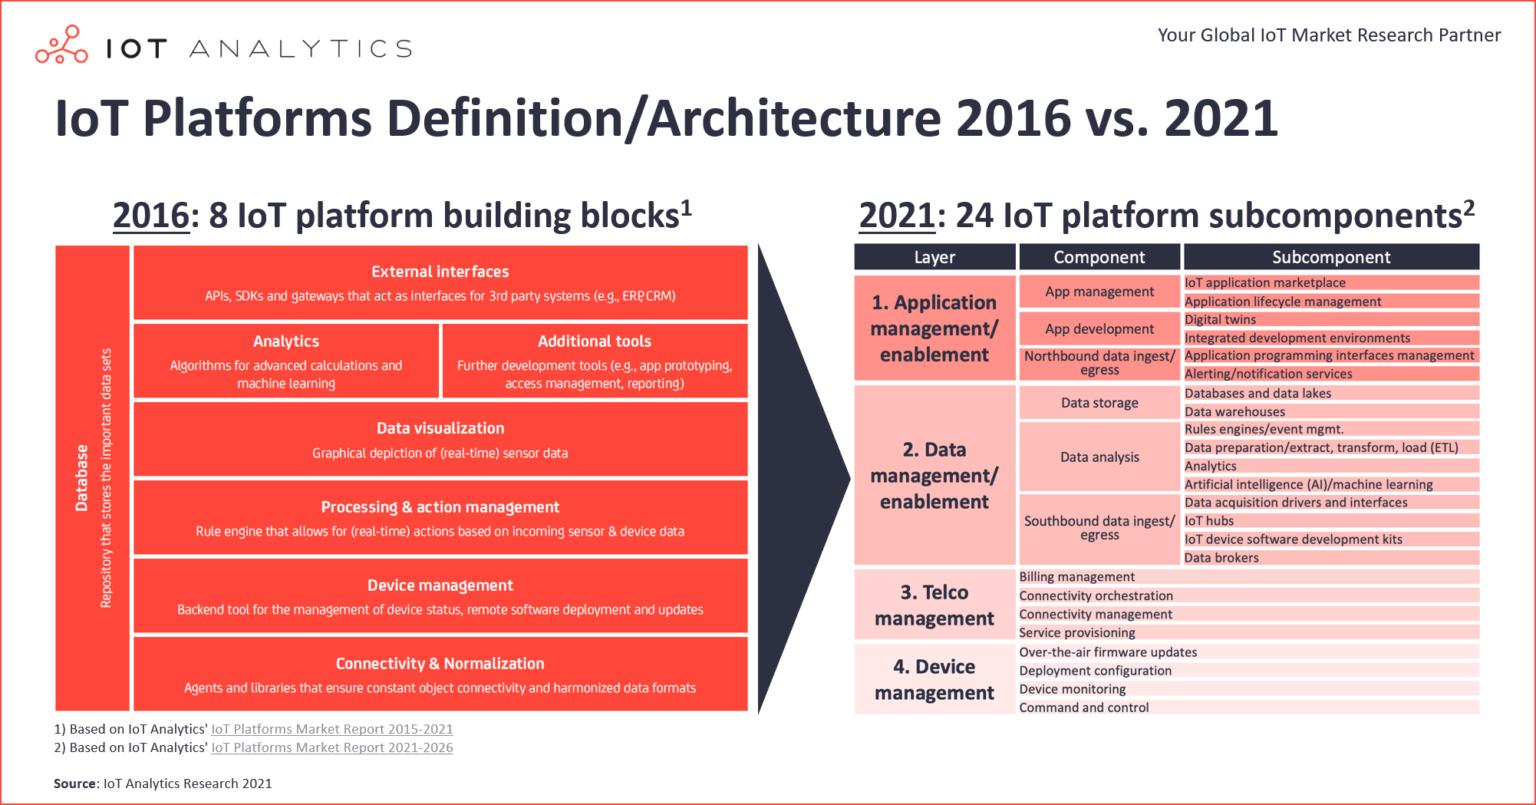 IoT-Platforms-Definition-Architecture-2016-vs-2021-1536x805.png (412 KB)